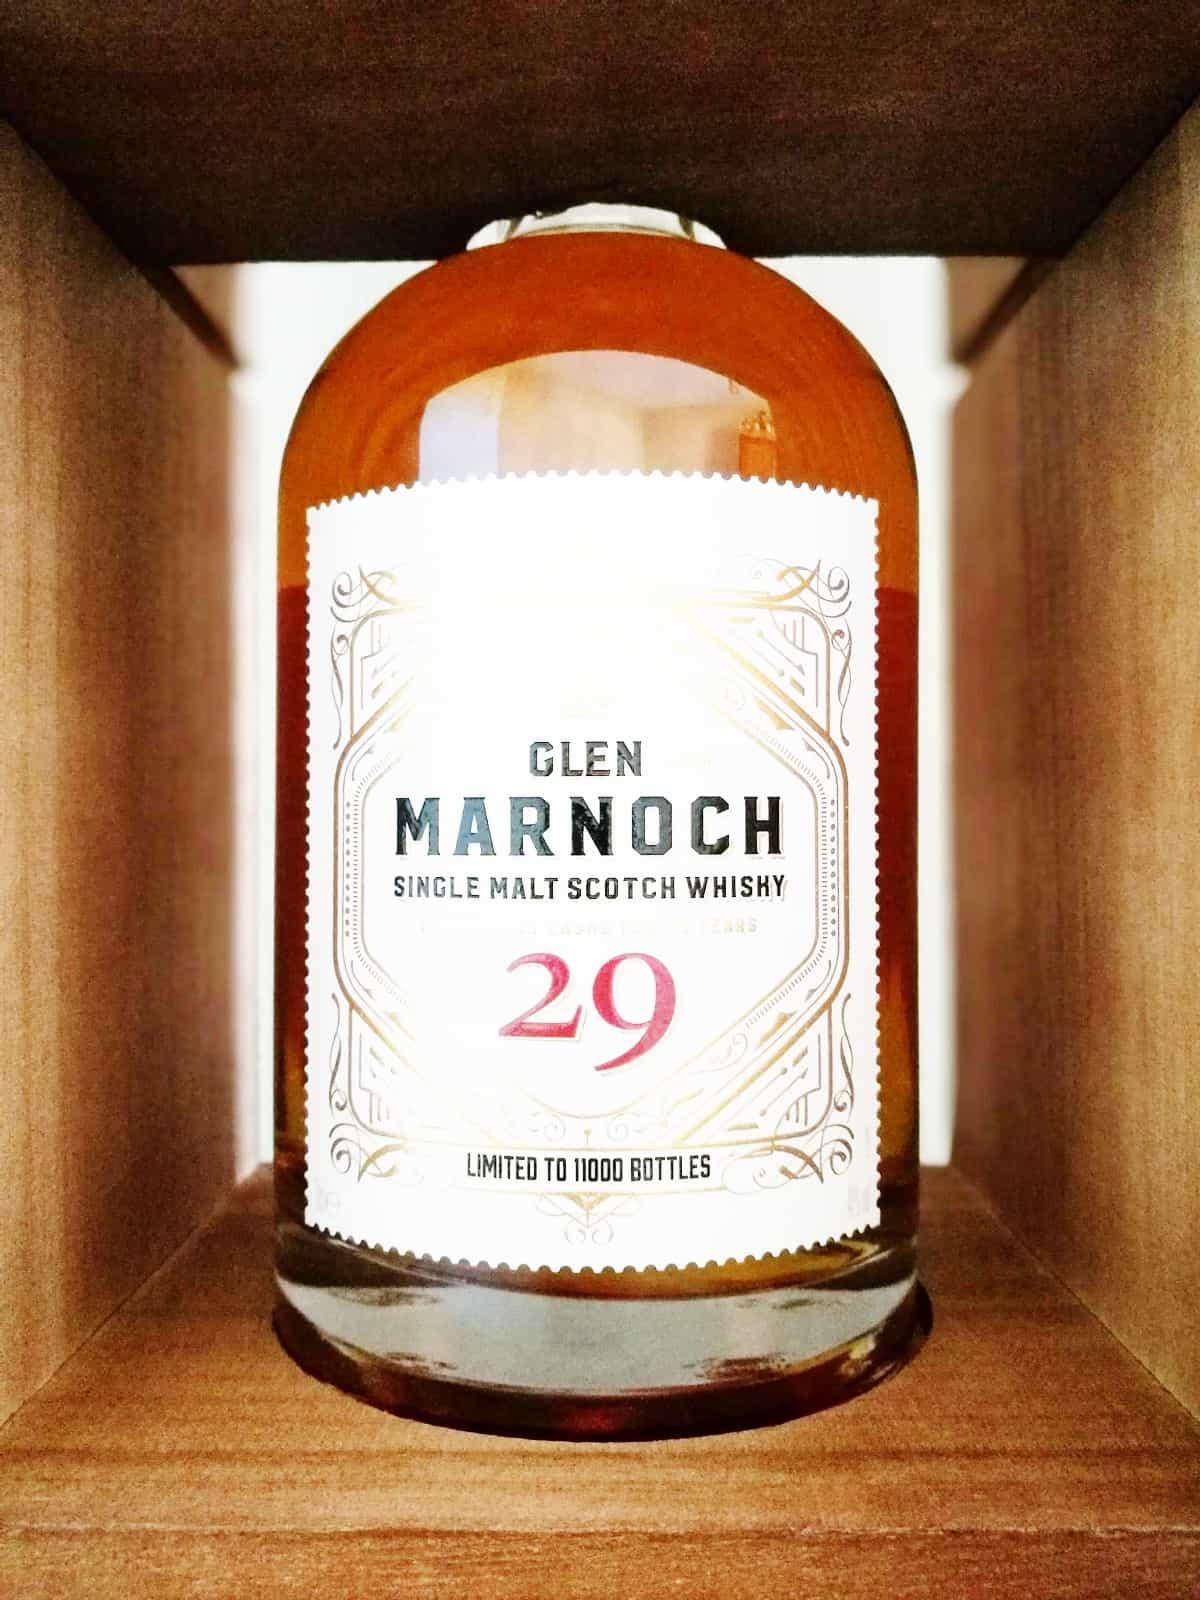 Glen Marnoch 29 Year Old